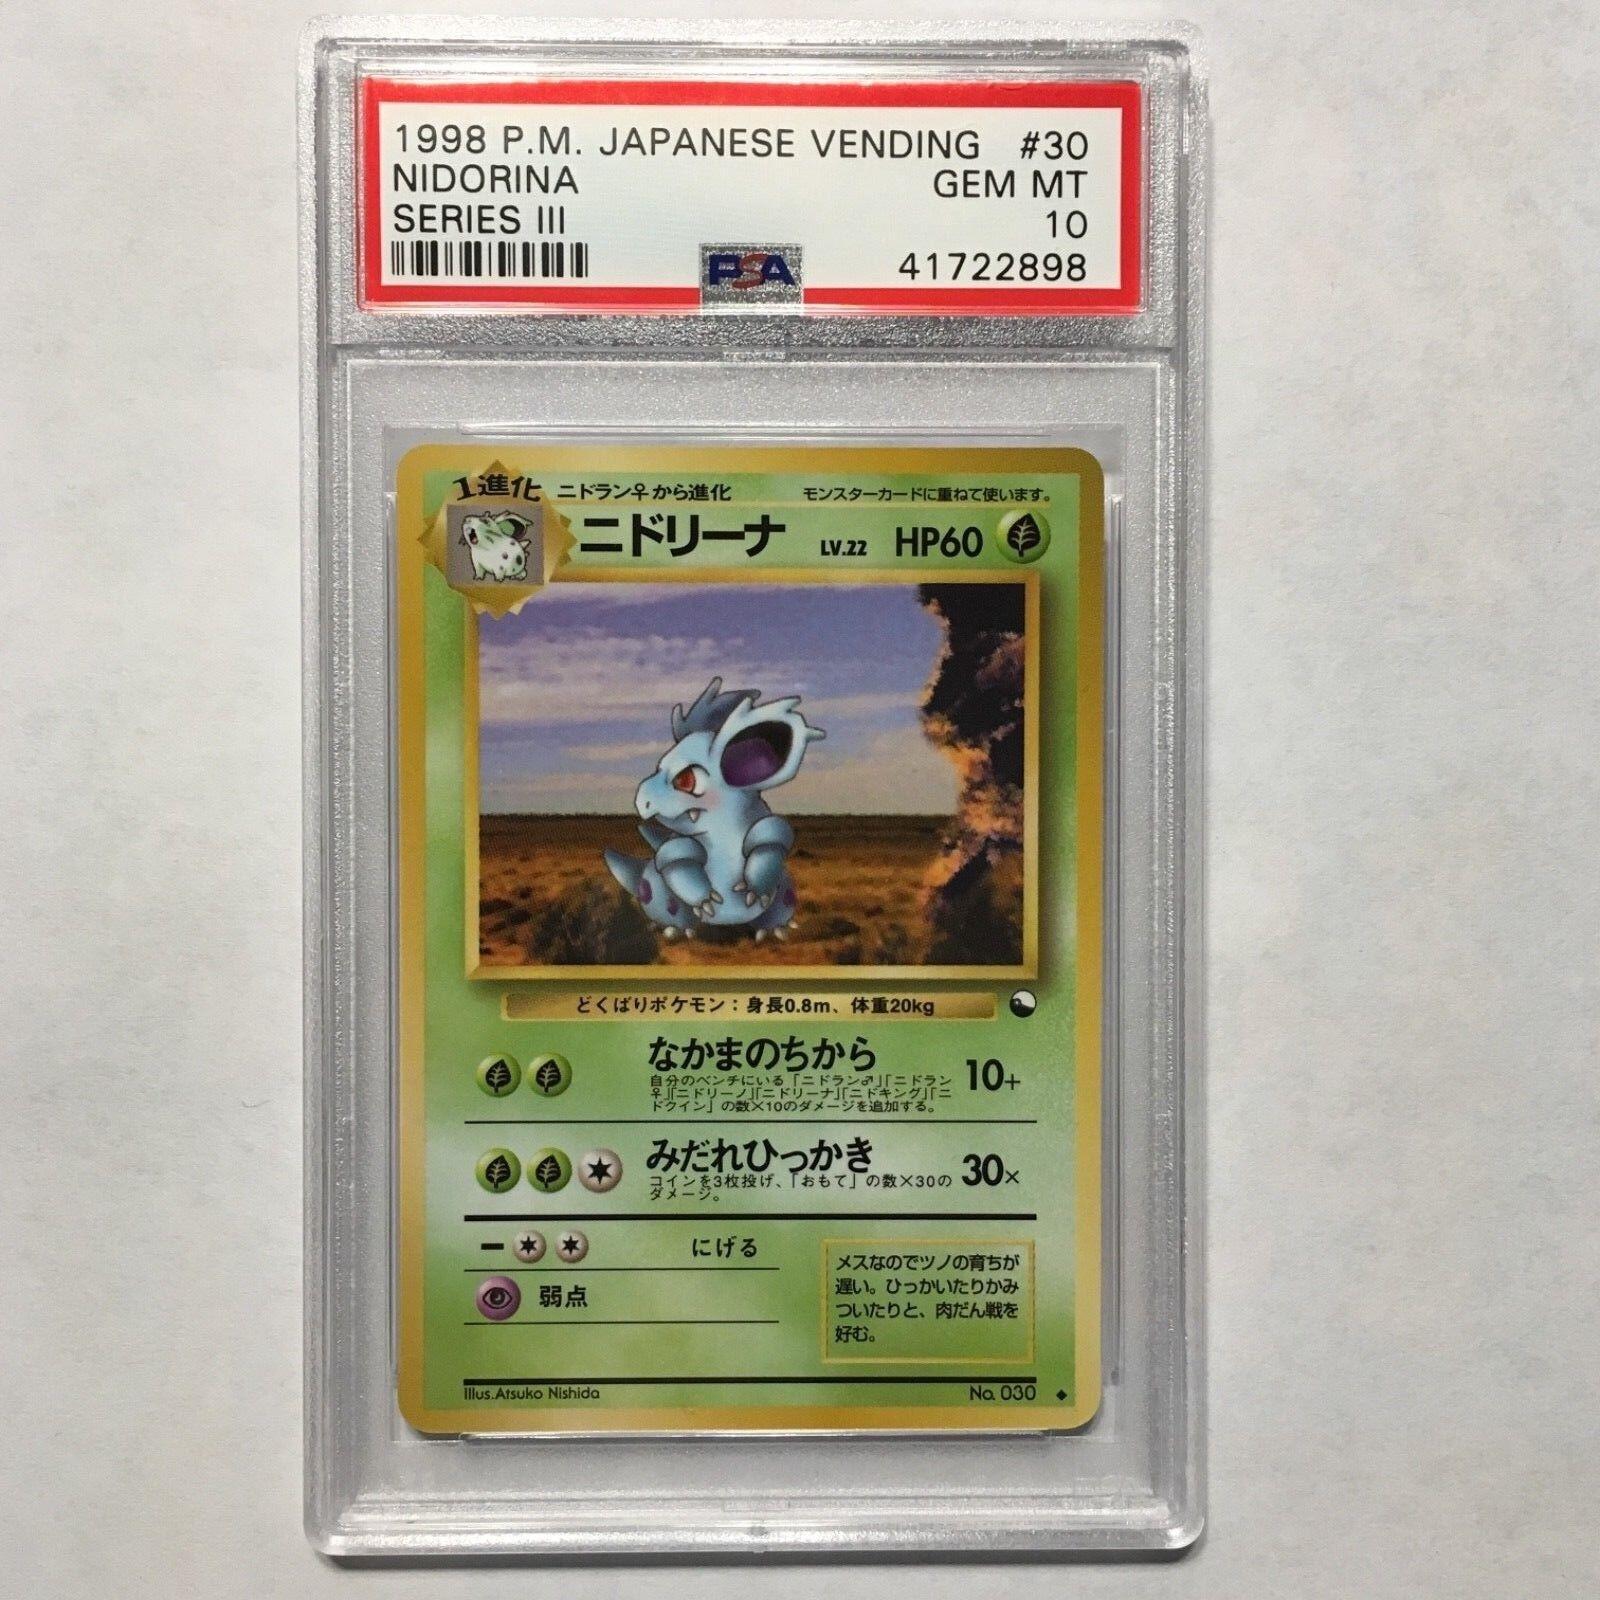 1998 psa 10 gem mint japanischen pokémon - reihe 3 glänzend selten nidorina